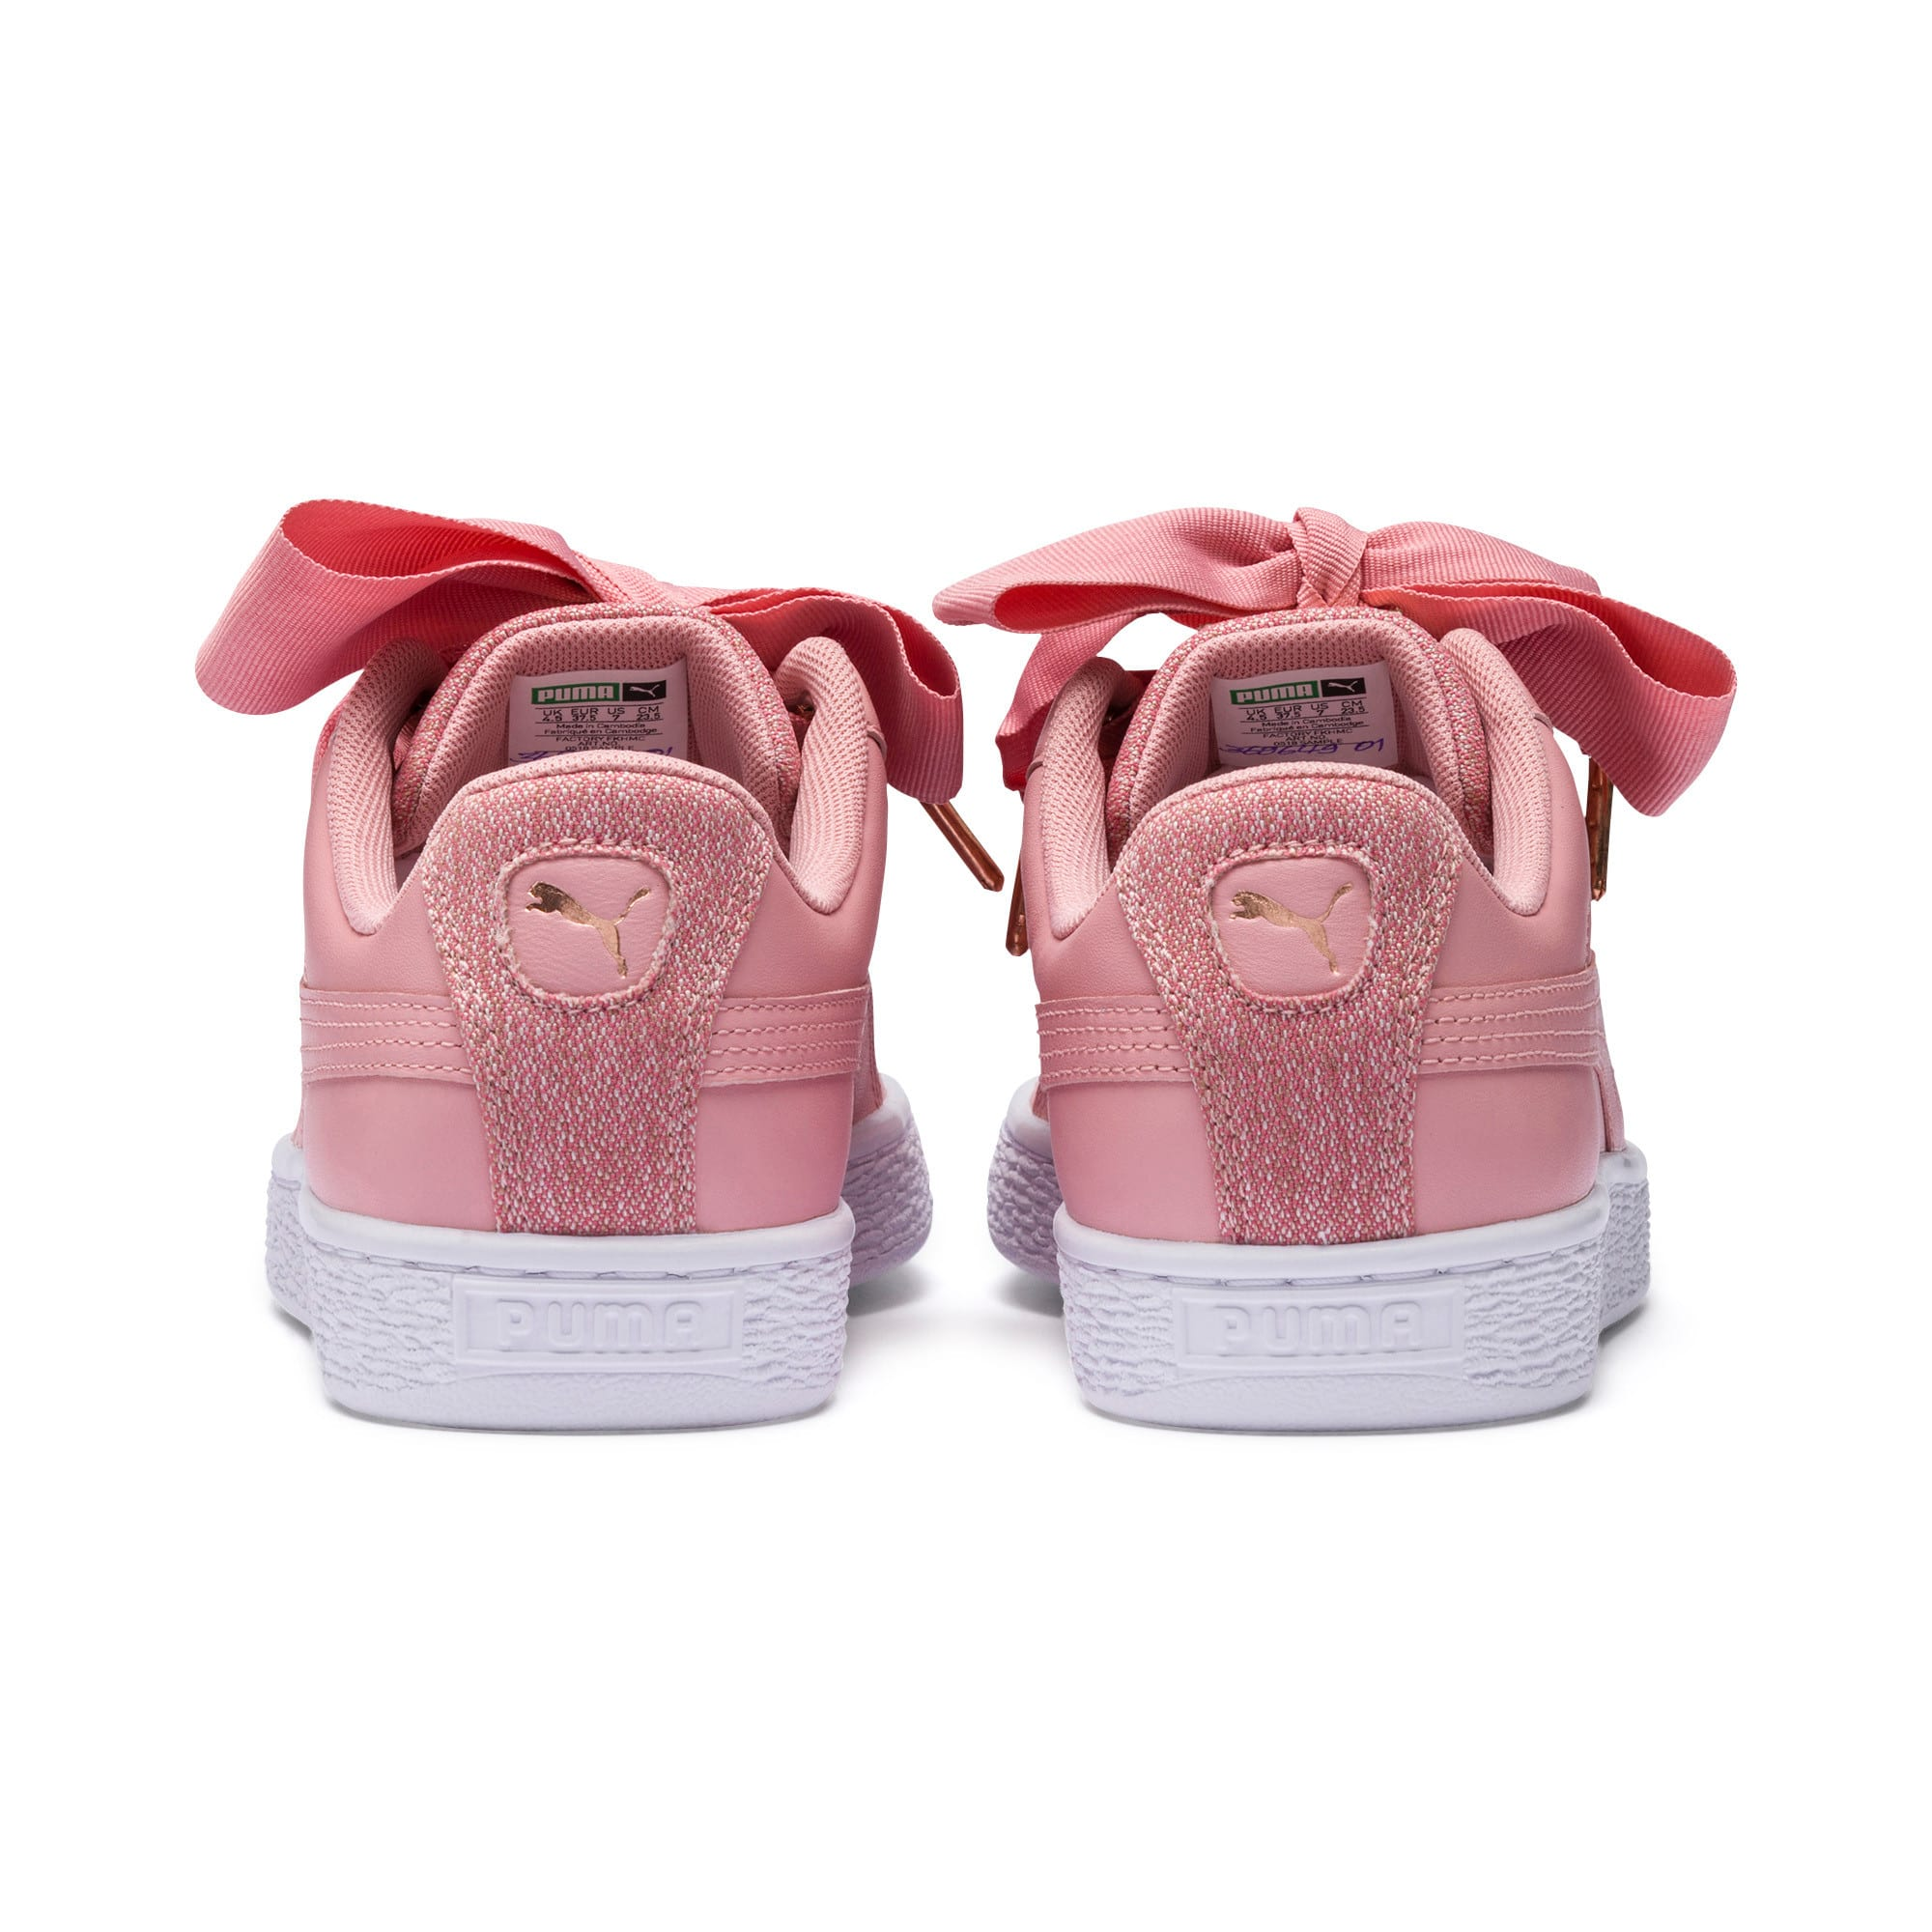 Thumbnail 4 of Basket Heart Woven Rose Women's Sneakers, Bridal Rose-Puma White, medium